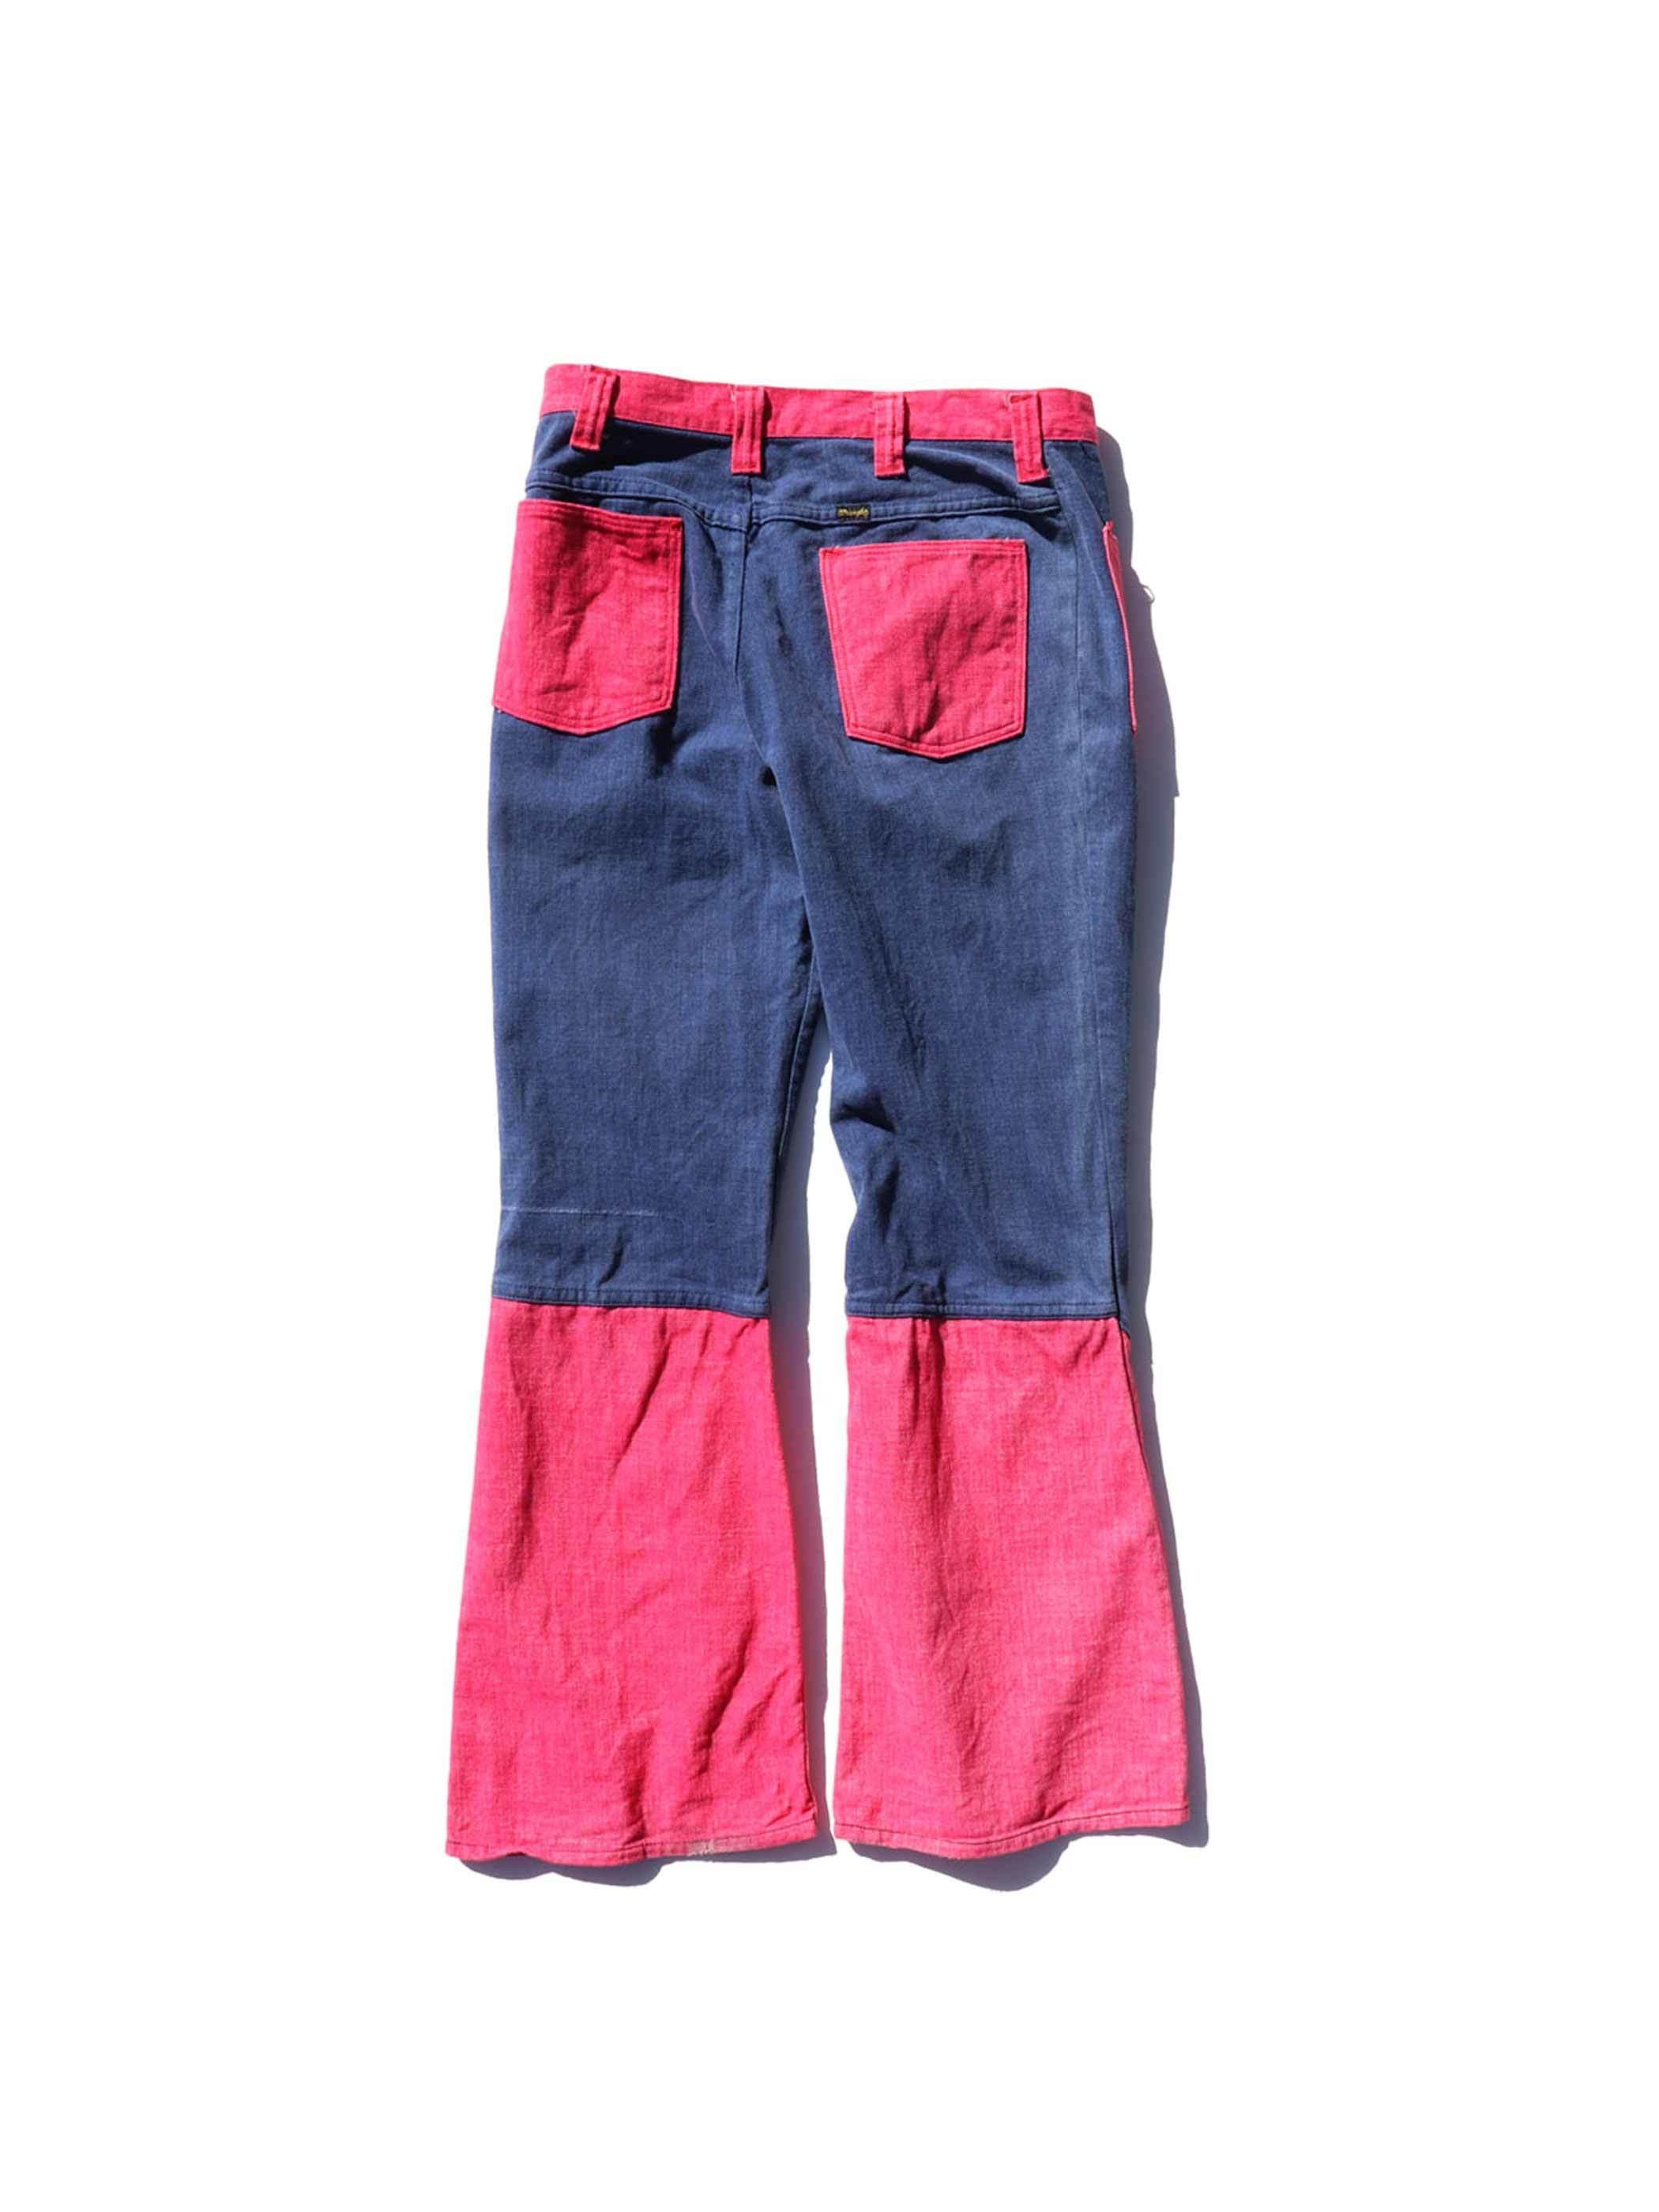 70's WRANGLER USA製 ブルー×ピンク フレアデニムパンツ [W32]